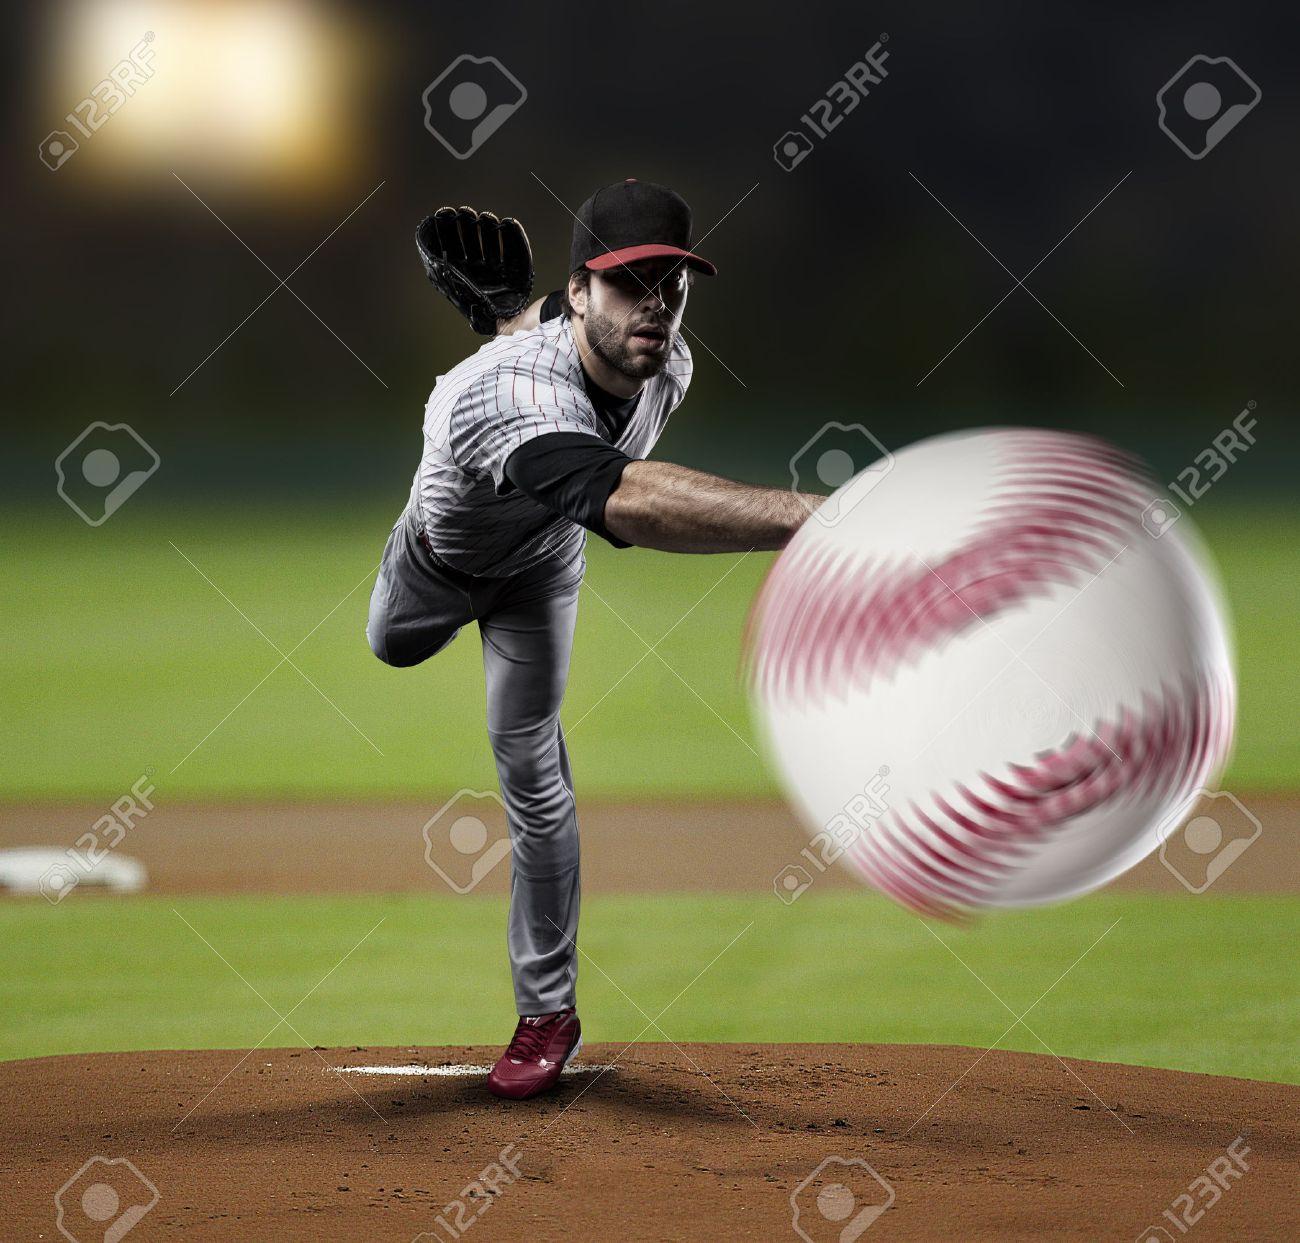 Pitcher Player throwing a ball, on a baseball Stadium. - 27529280